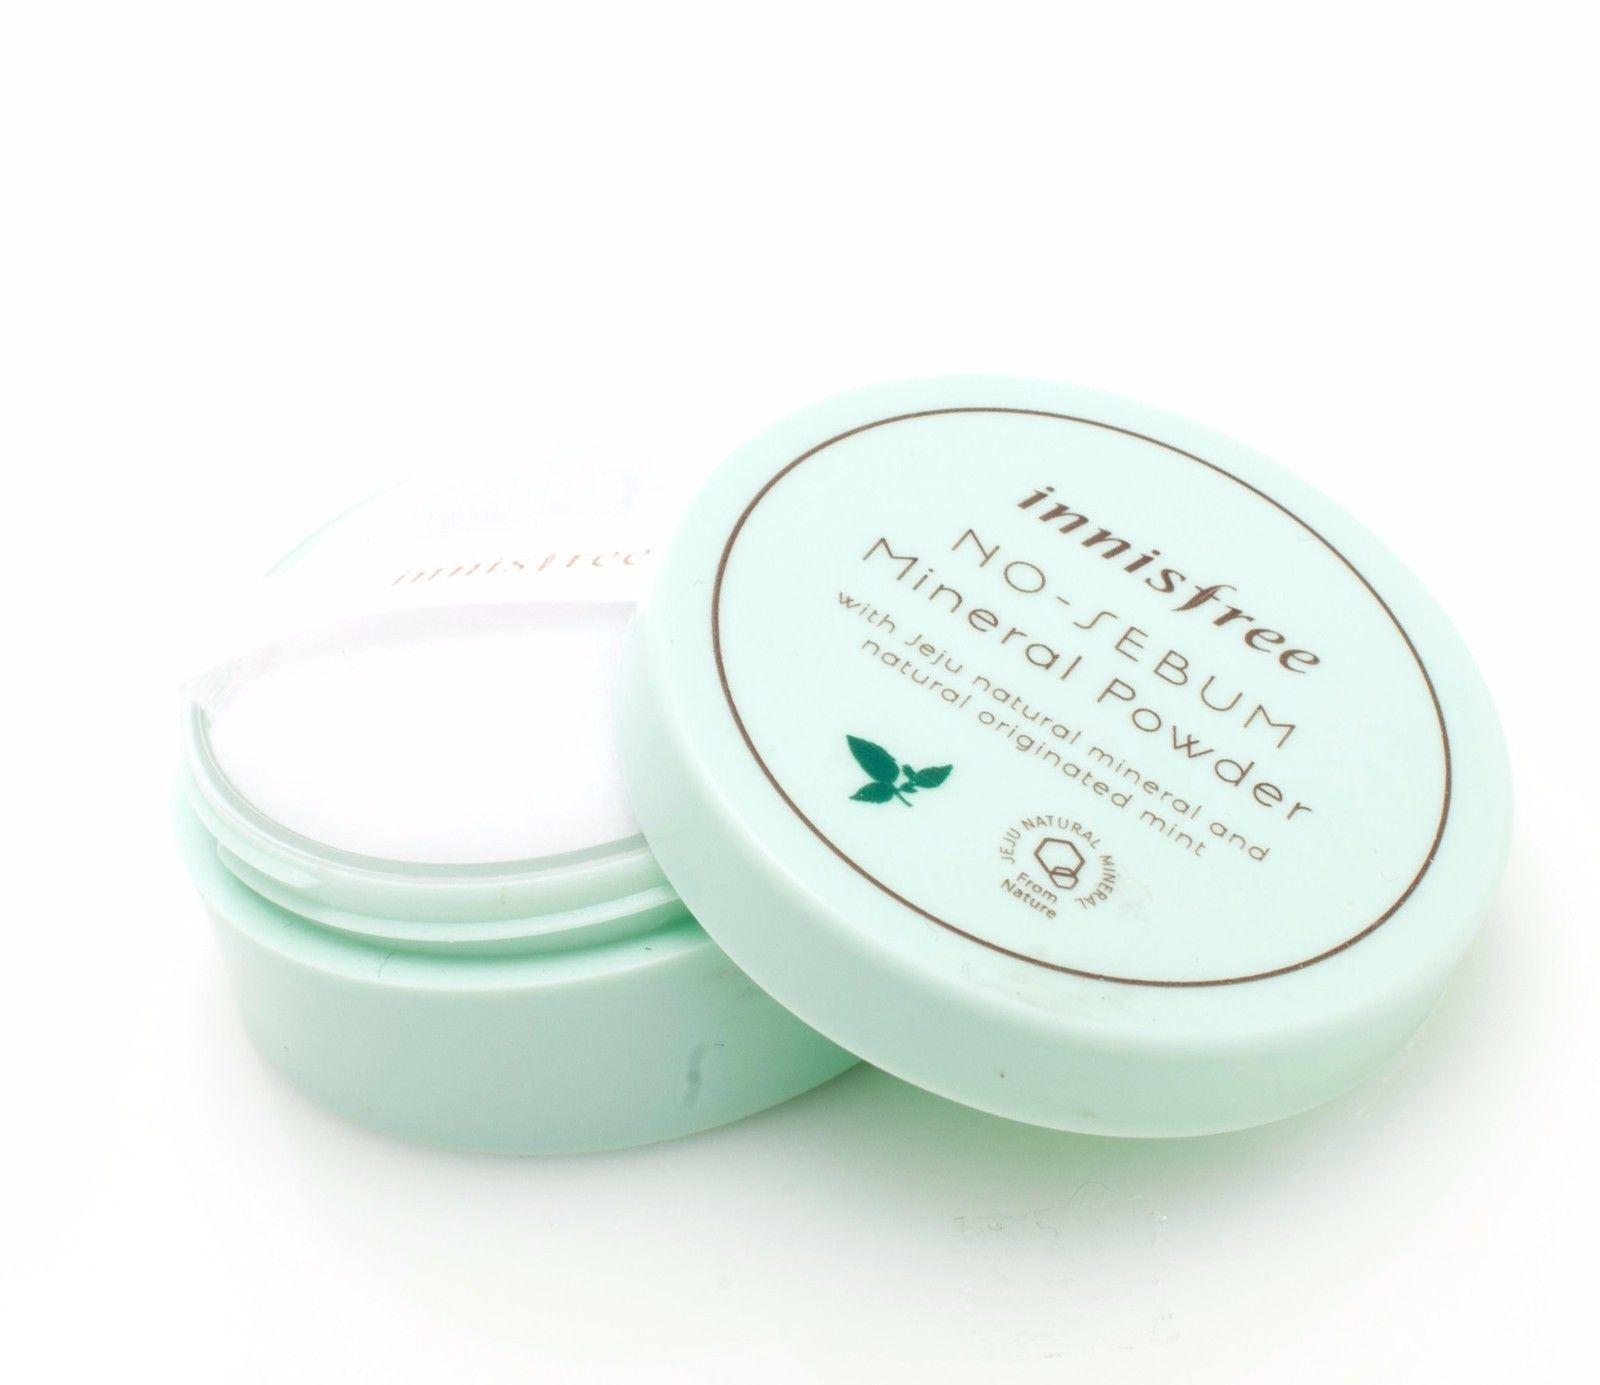 Innisfree No Sebum Mineral Powder 5G For Oily Skin Korean Cosmetics